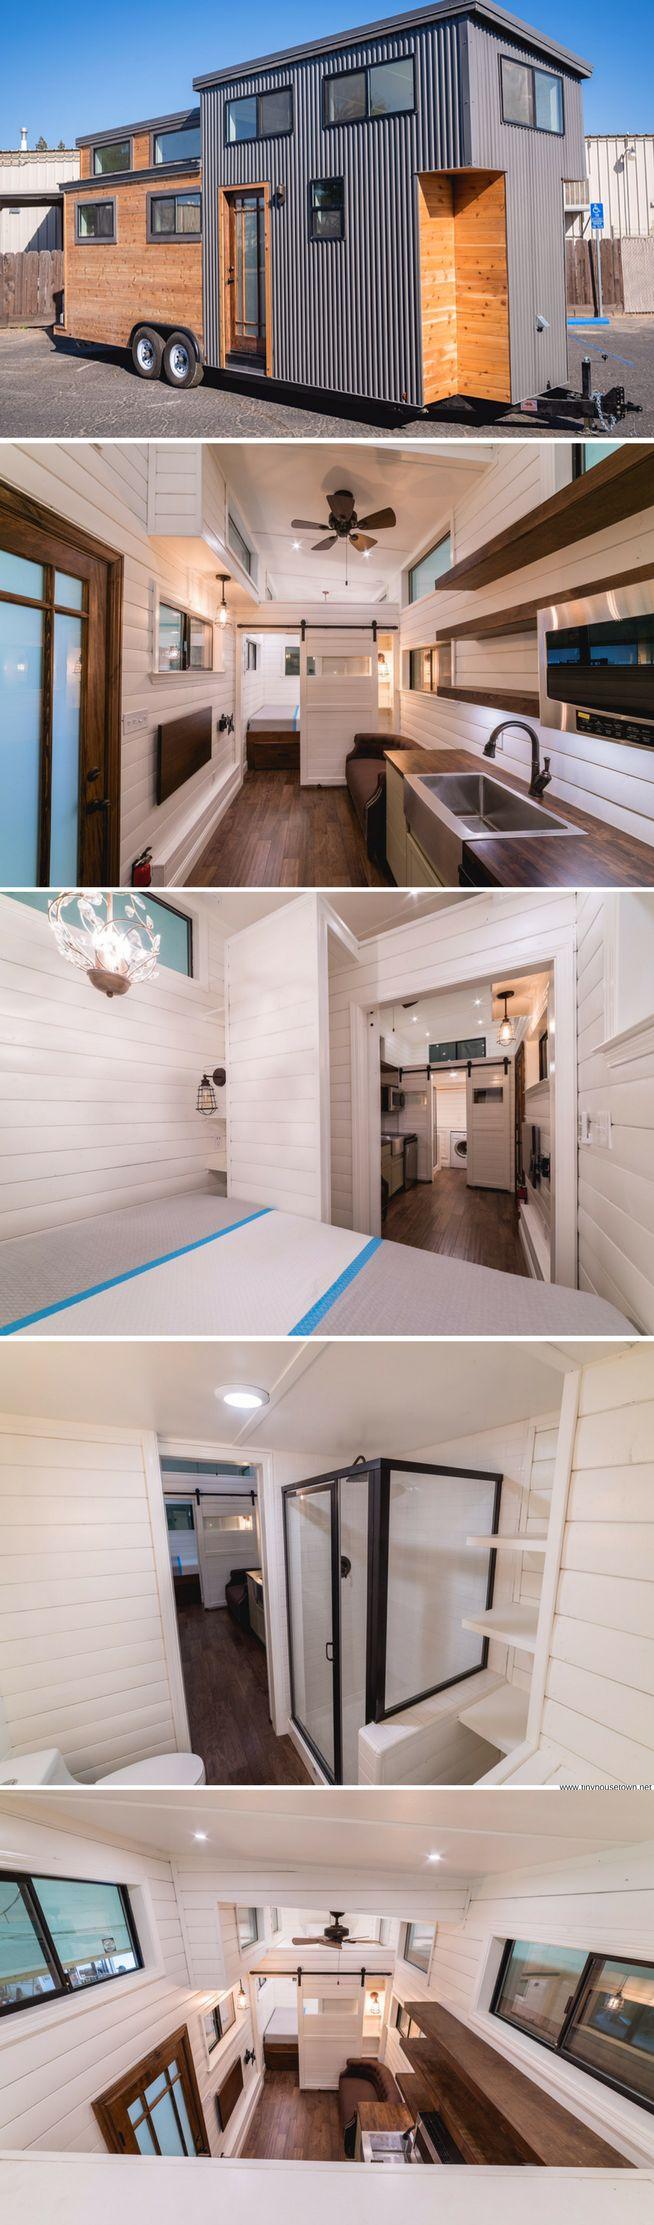 Super 17 Best Ideas About Tiny House Plans On Pinterest Small House Inspirational Interior Design Netriciaus